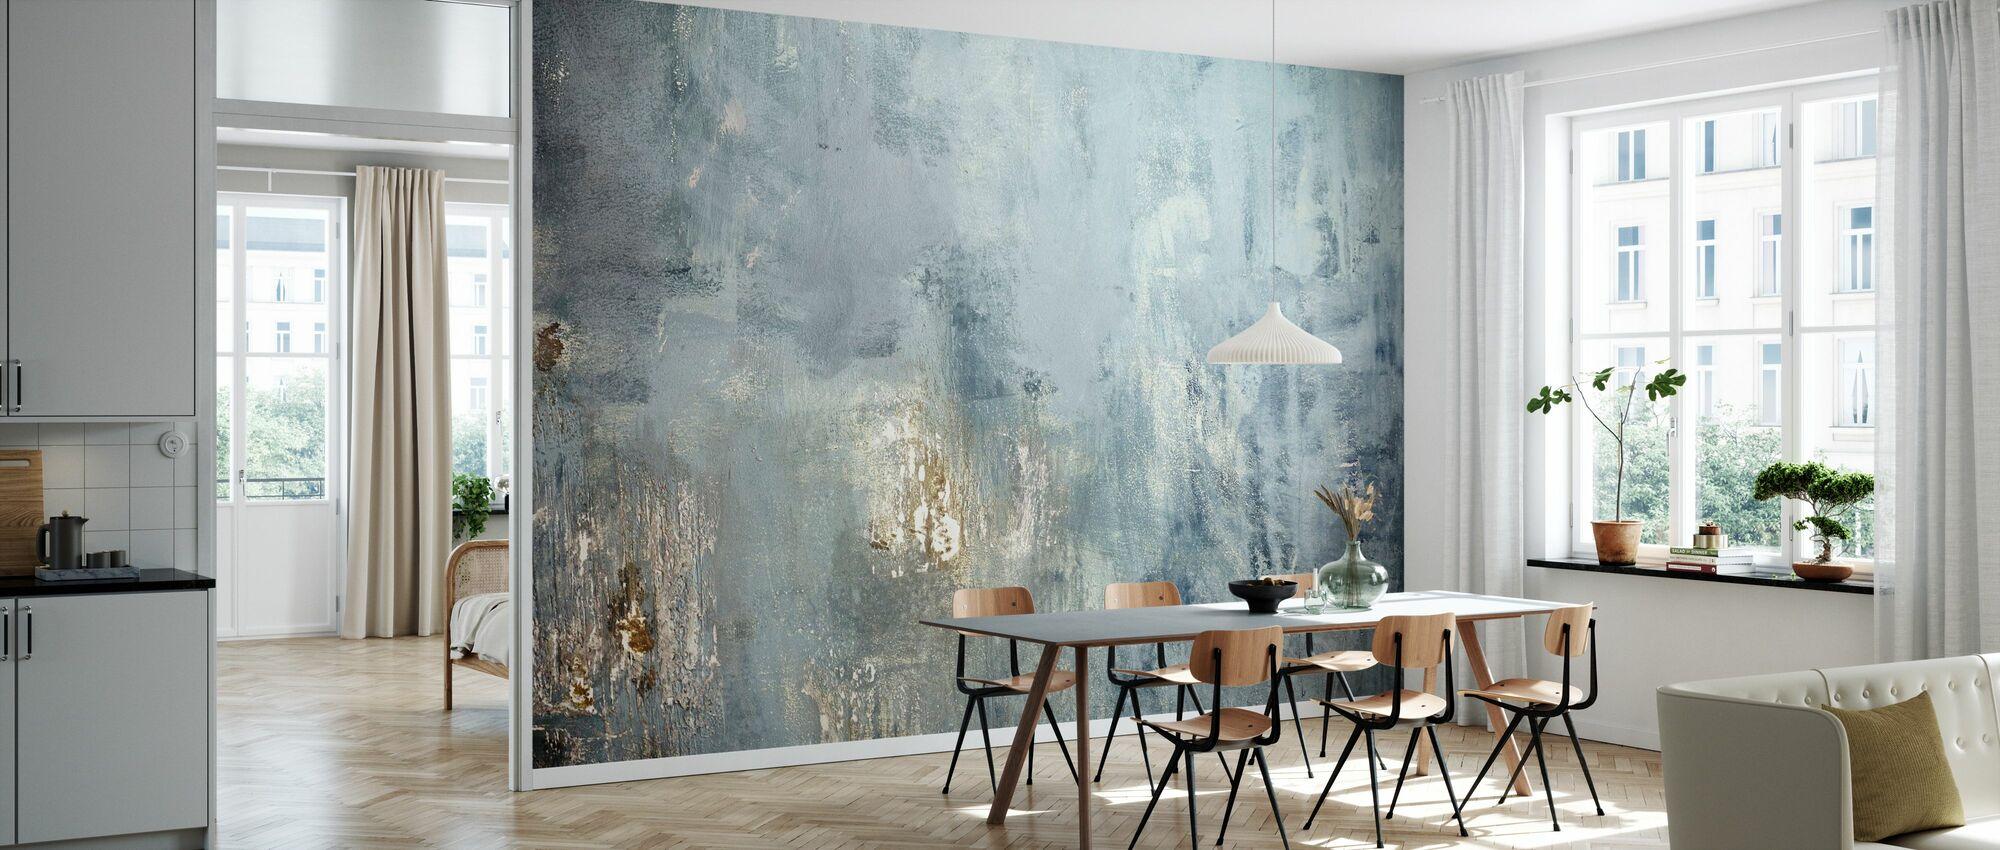 Grunge Wall Painted - Wallpaper - Kitchen